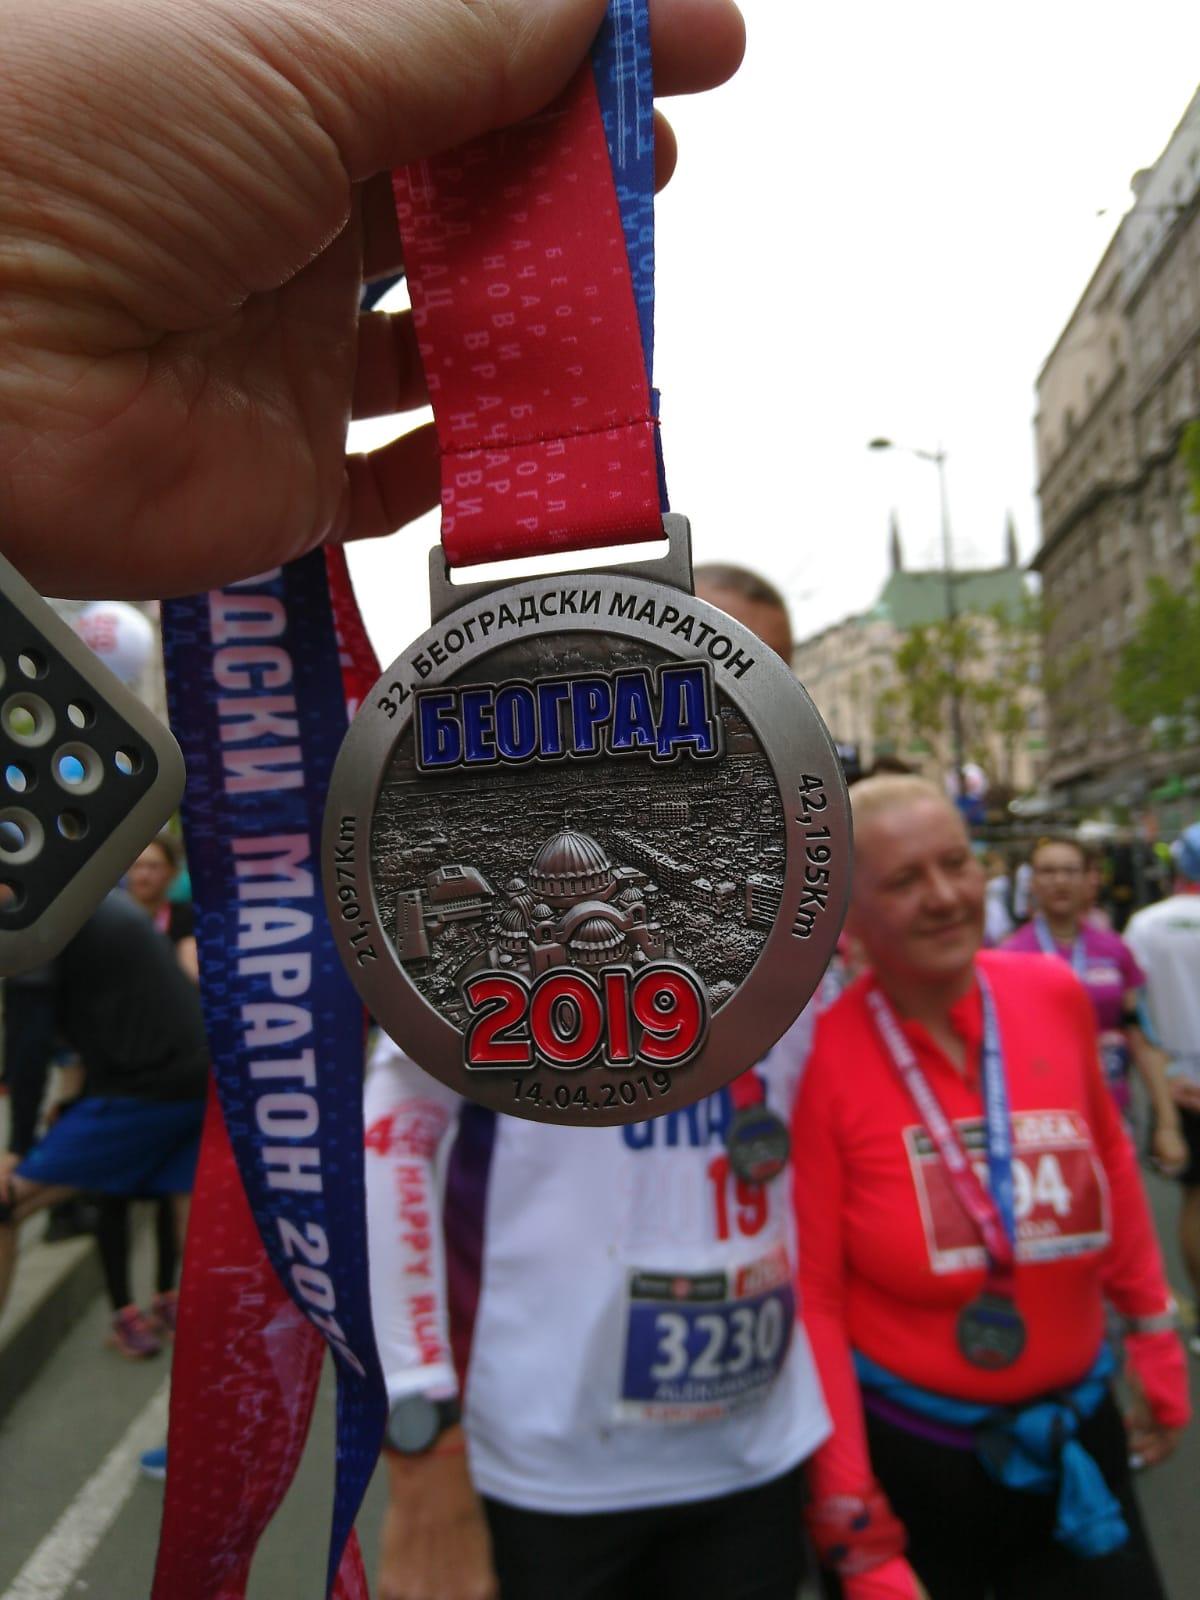 Medaille halve marathon Belgrado